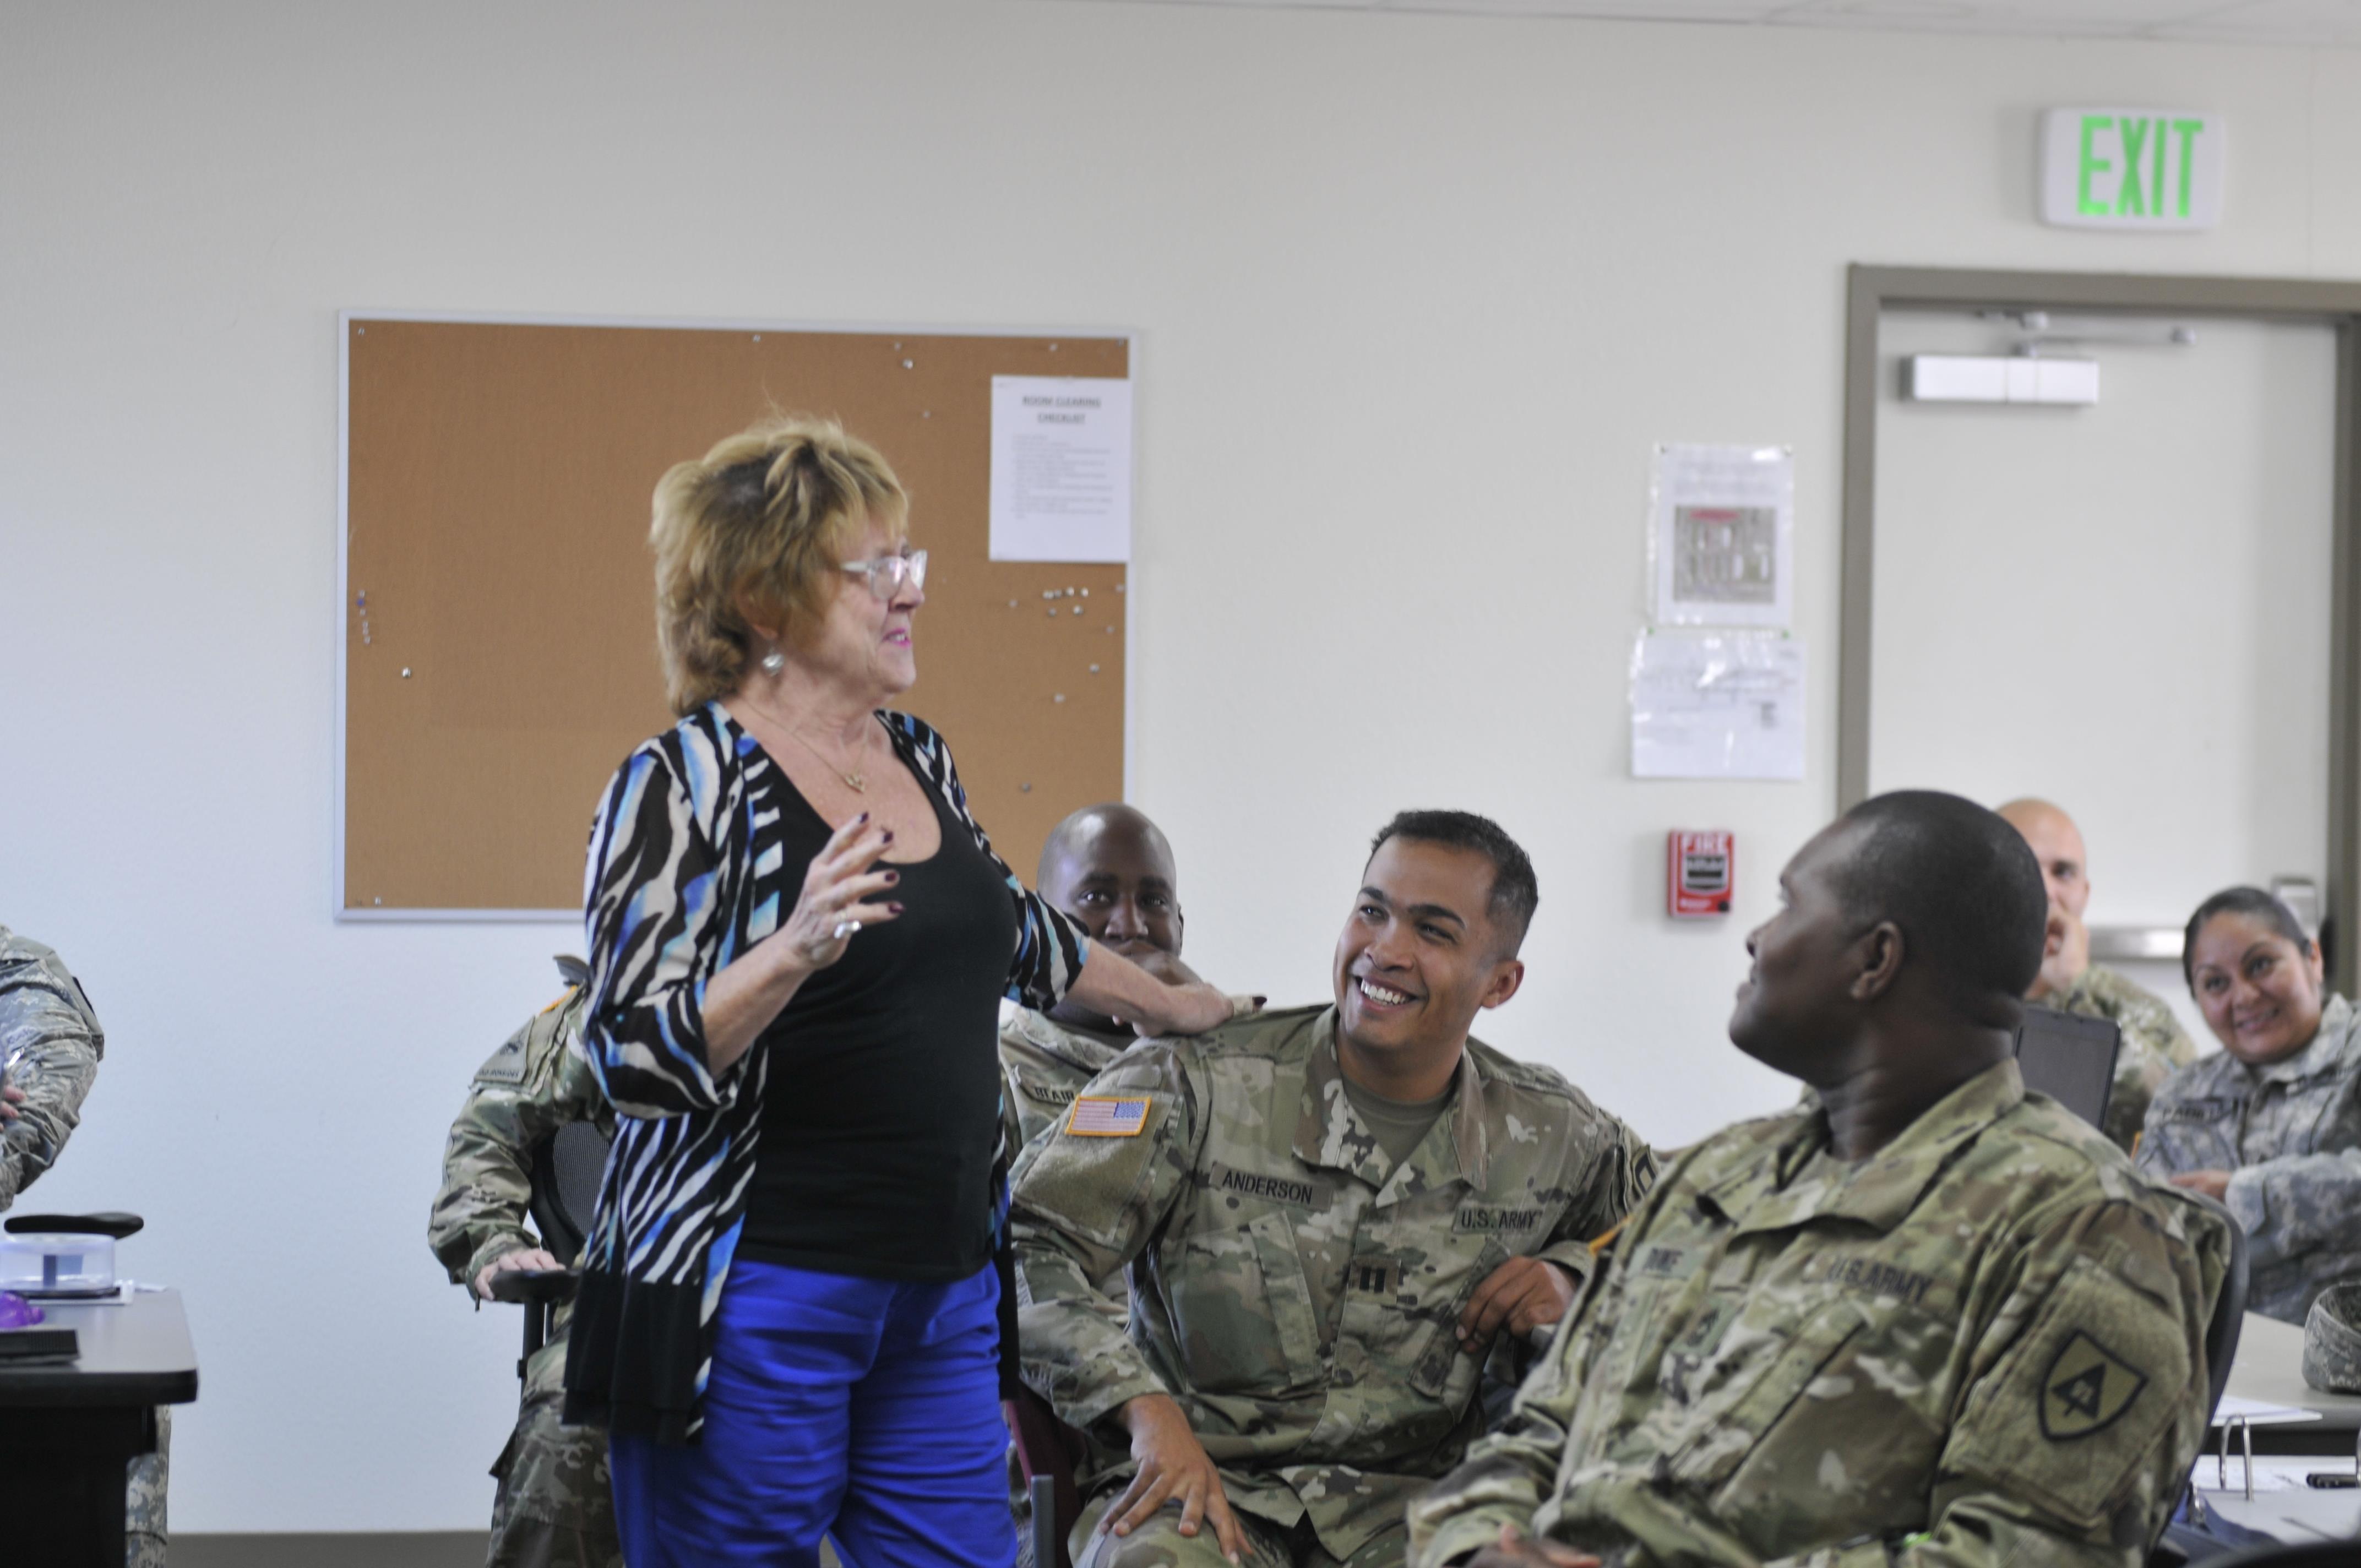 63rd rsc hosts intensive 10 day sharp training event us army 63rd rsc hosts intensive 10 day sharp training event xflitez Images